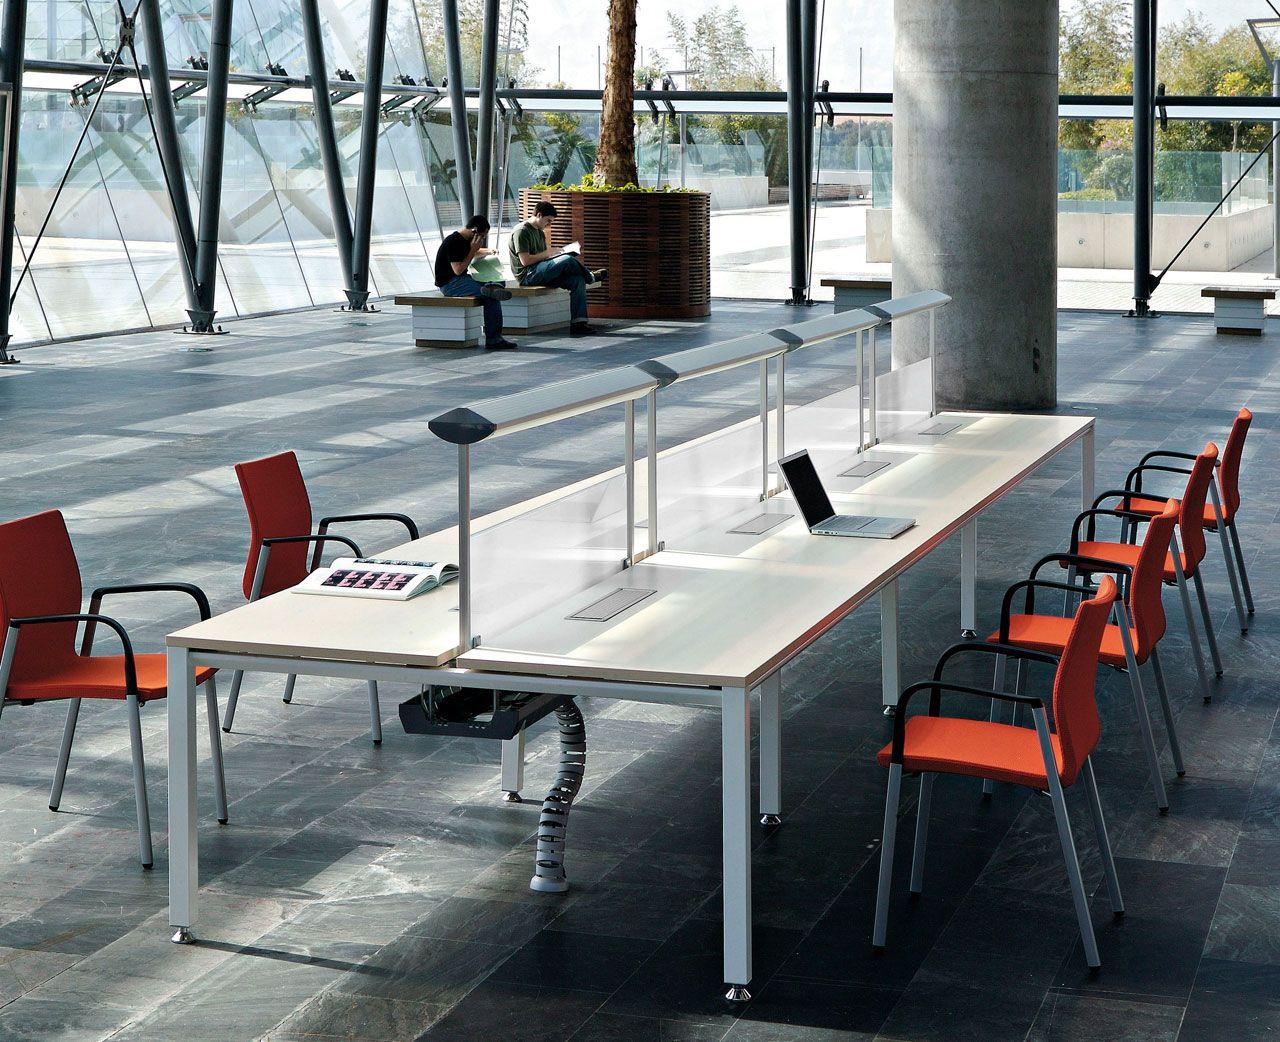 Vital, mesas rectas, dobles, ergonómicas, de reunión, mostradores, que se adaptan de forma flexible a las diferentes necesidades de trabajo en la oficina.